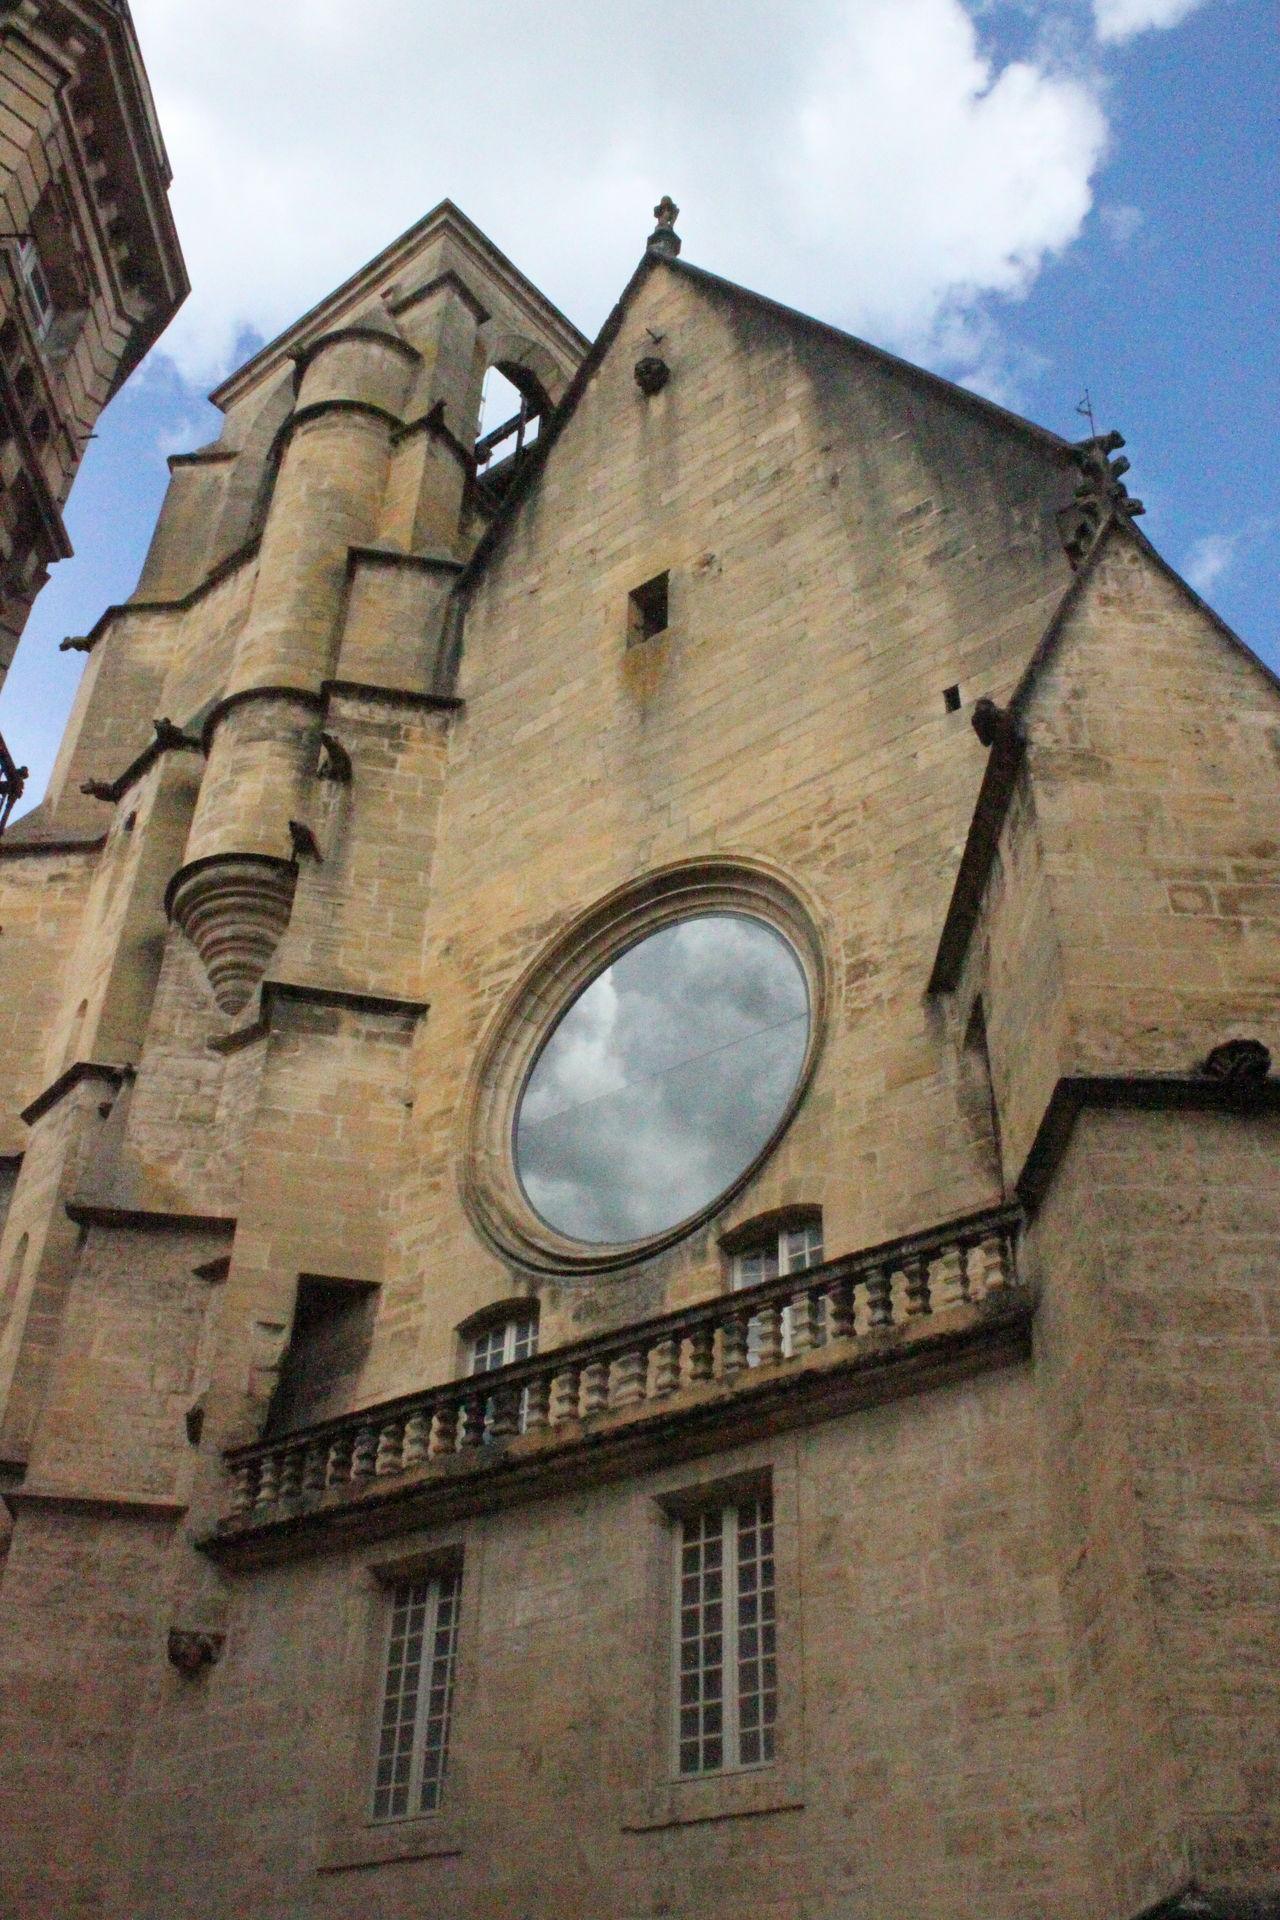 Architecture Building Exterior Canonphotography Eye4photography  EyeEm Gallery Medieval Architecture Modern Door Summer2015 Tourist Attraction  Tourist Destination